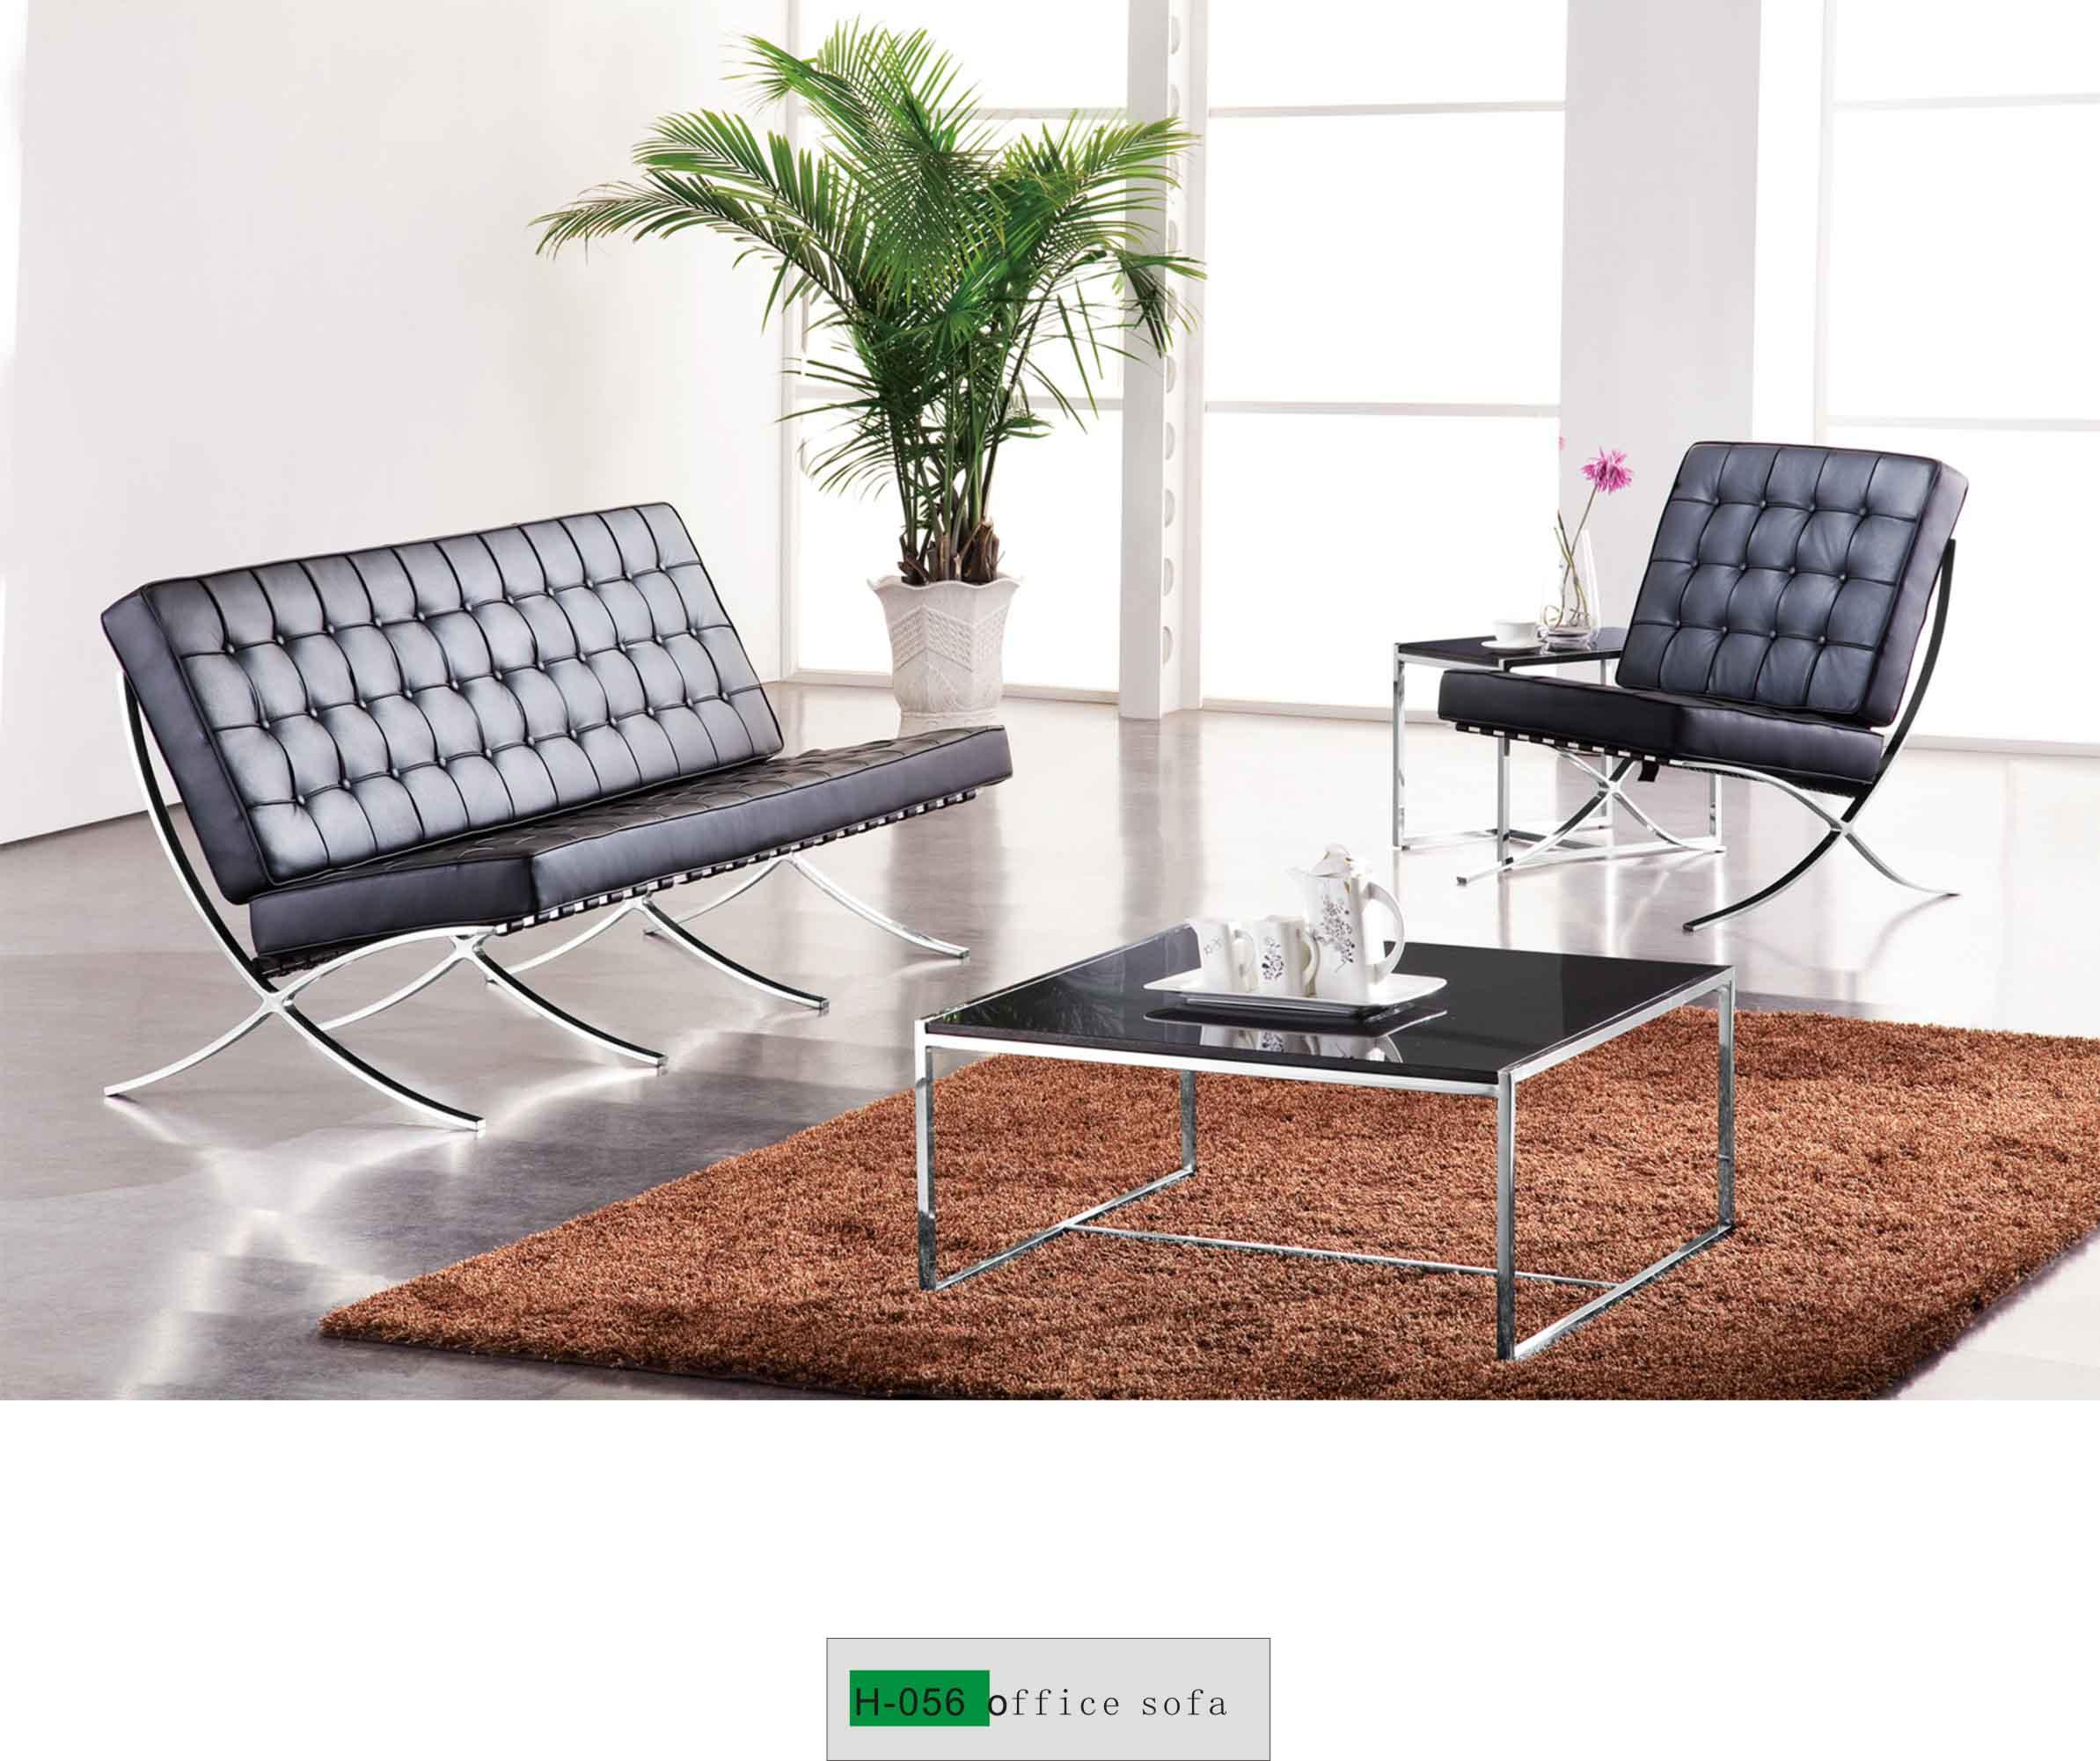 Steel Office Sofa Set H-056 - Buy high end office sofa ...